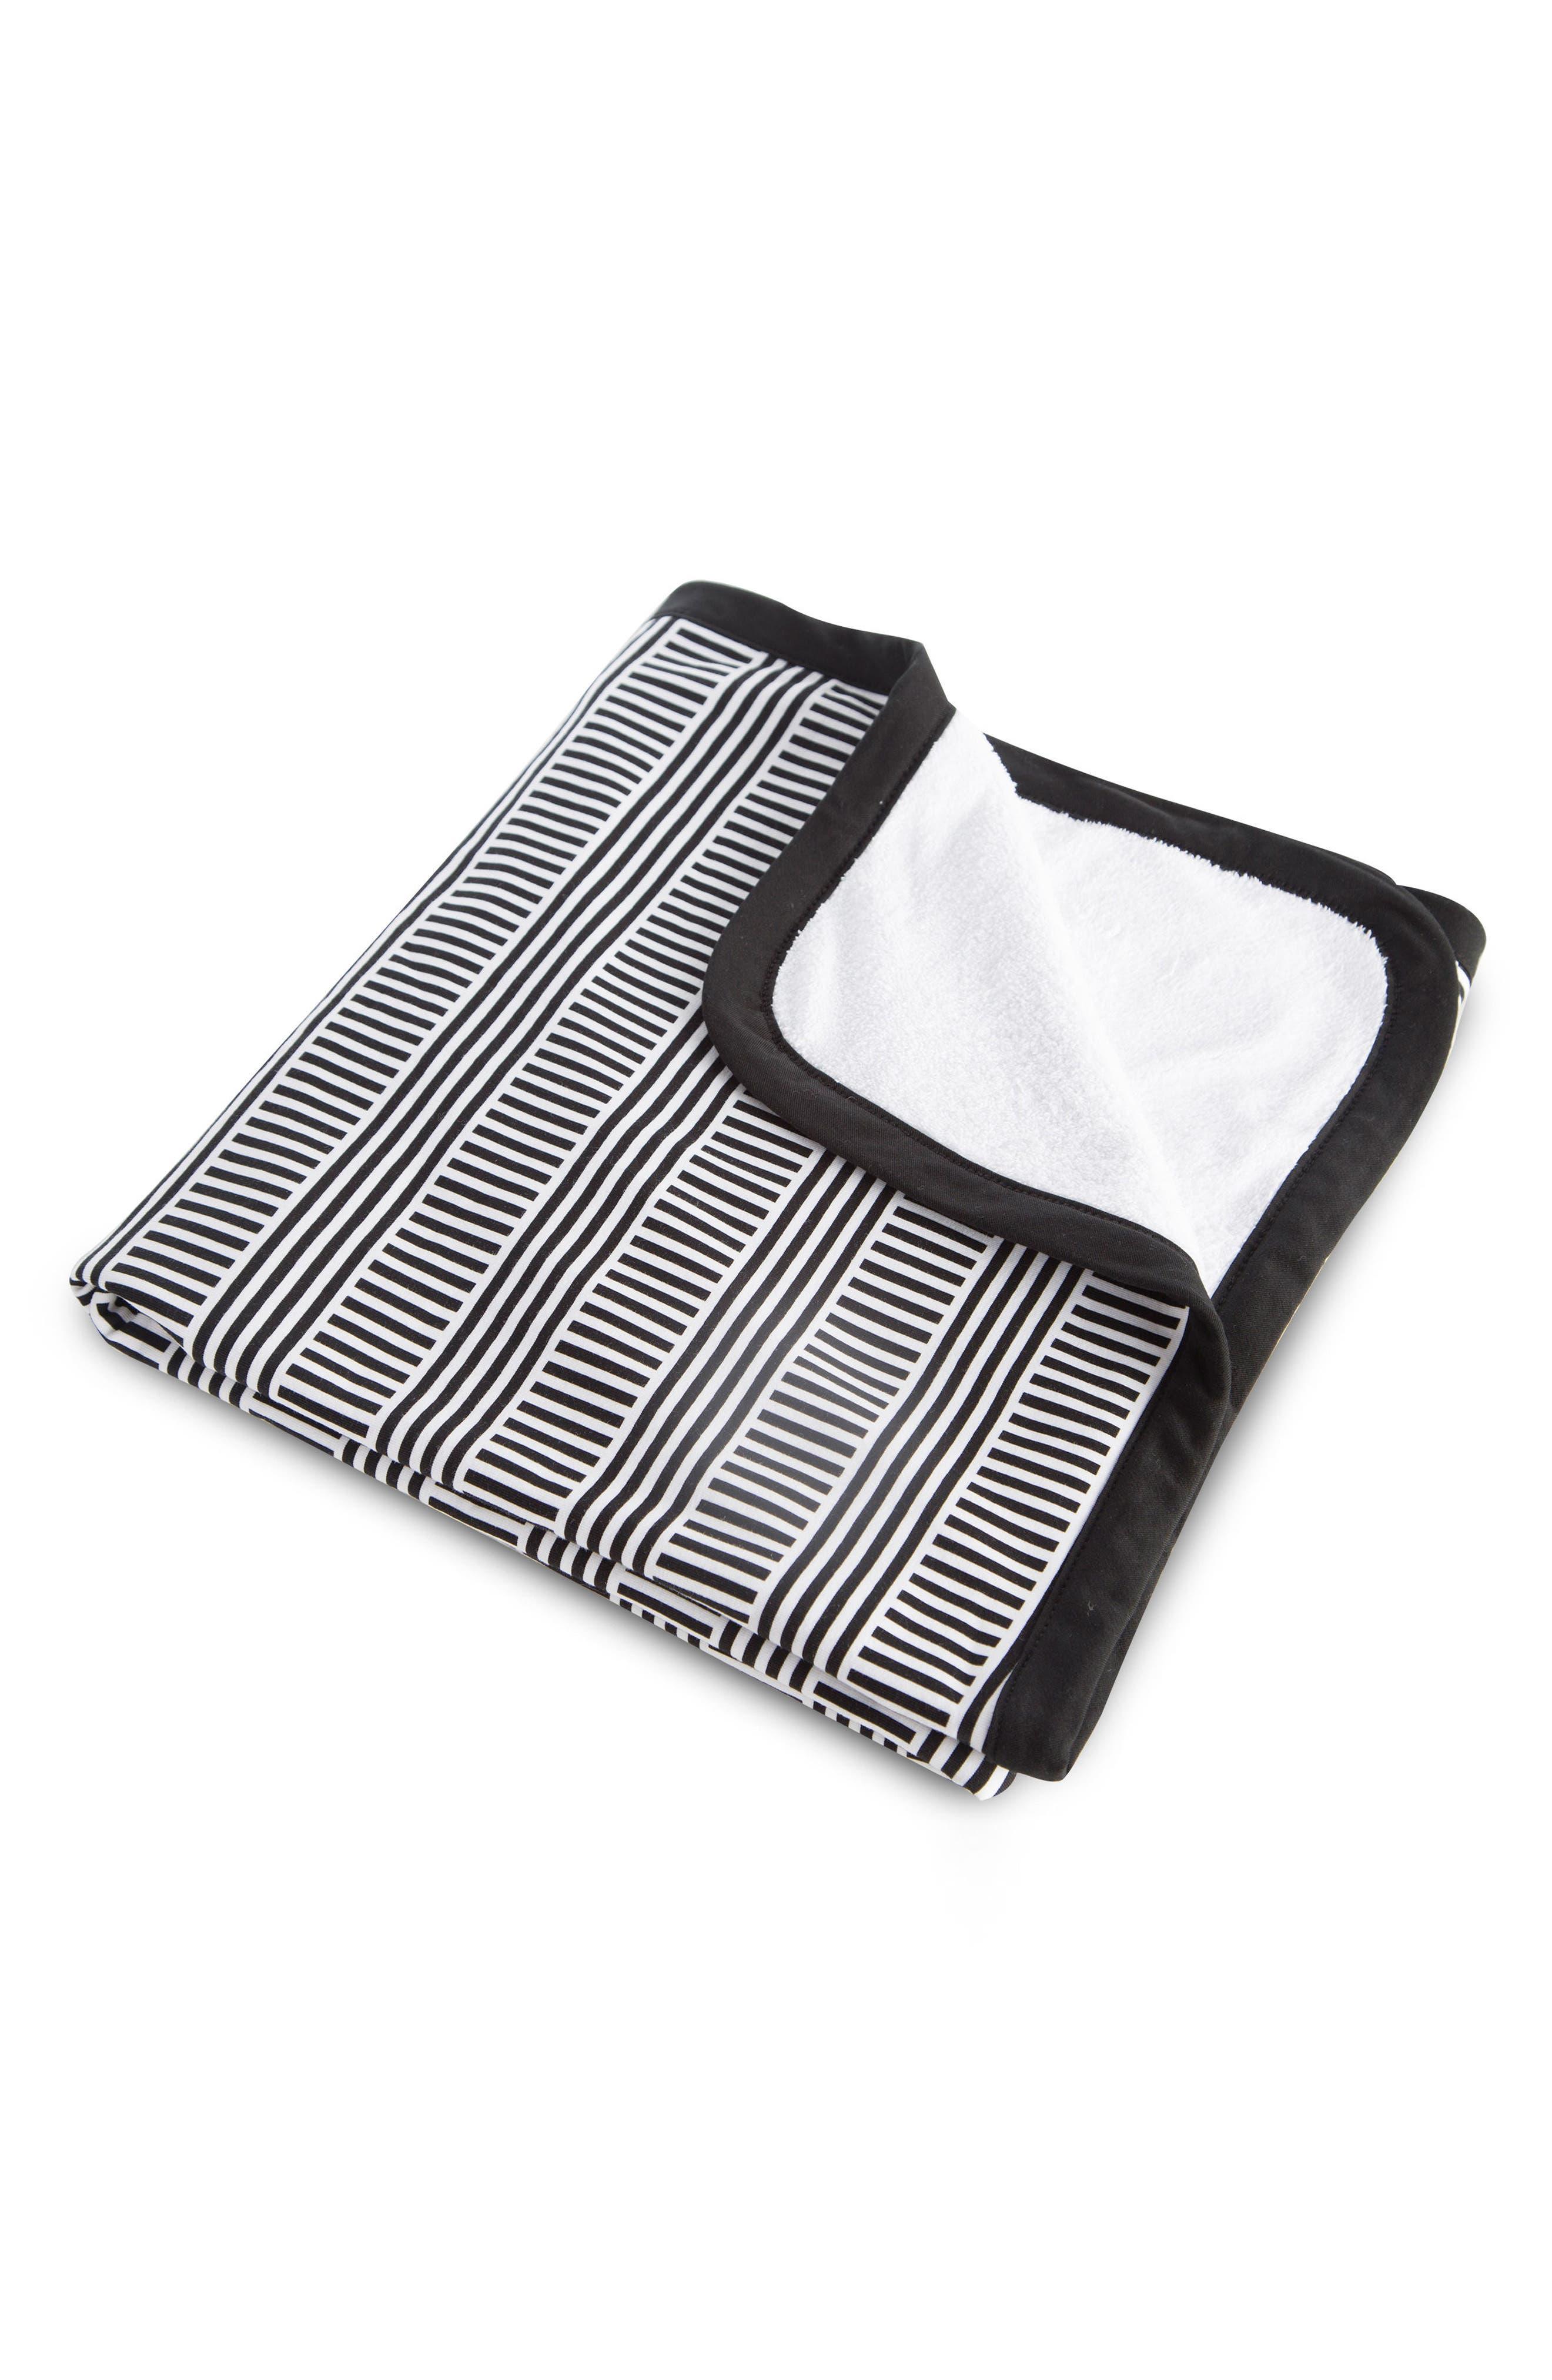 Cuddle Blanket,                         Main,                         color, BLACK/ WHITE